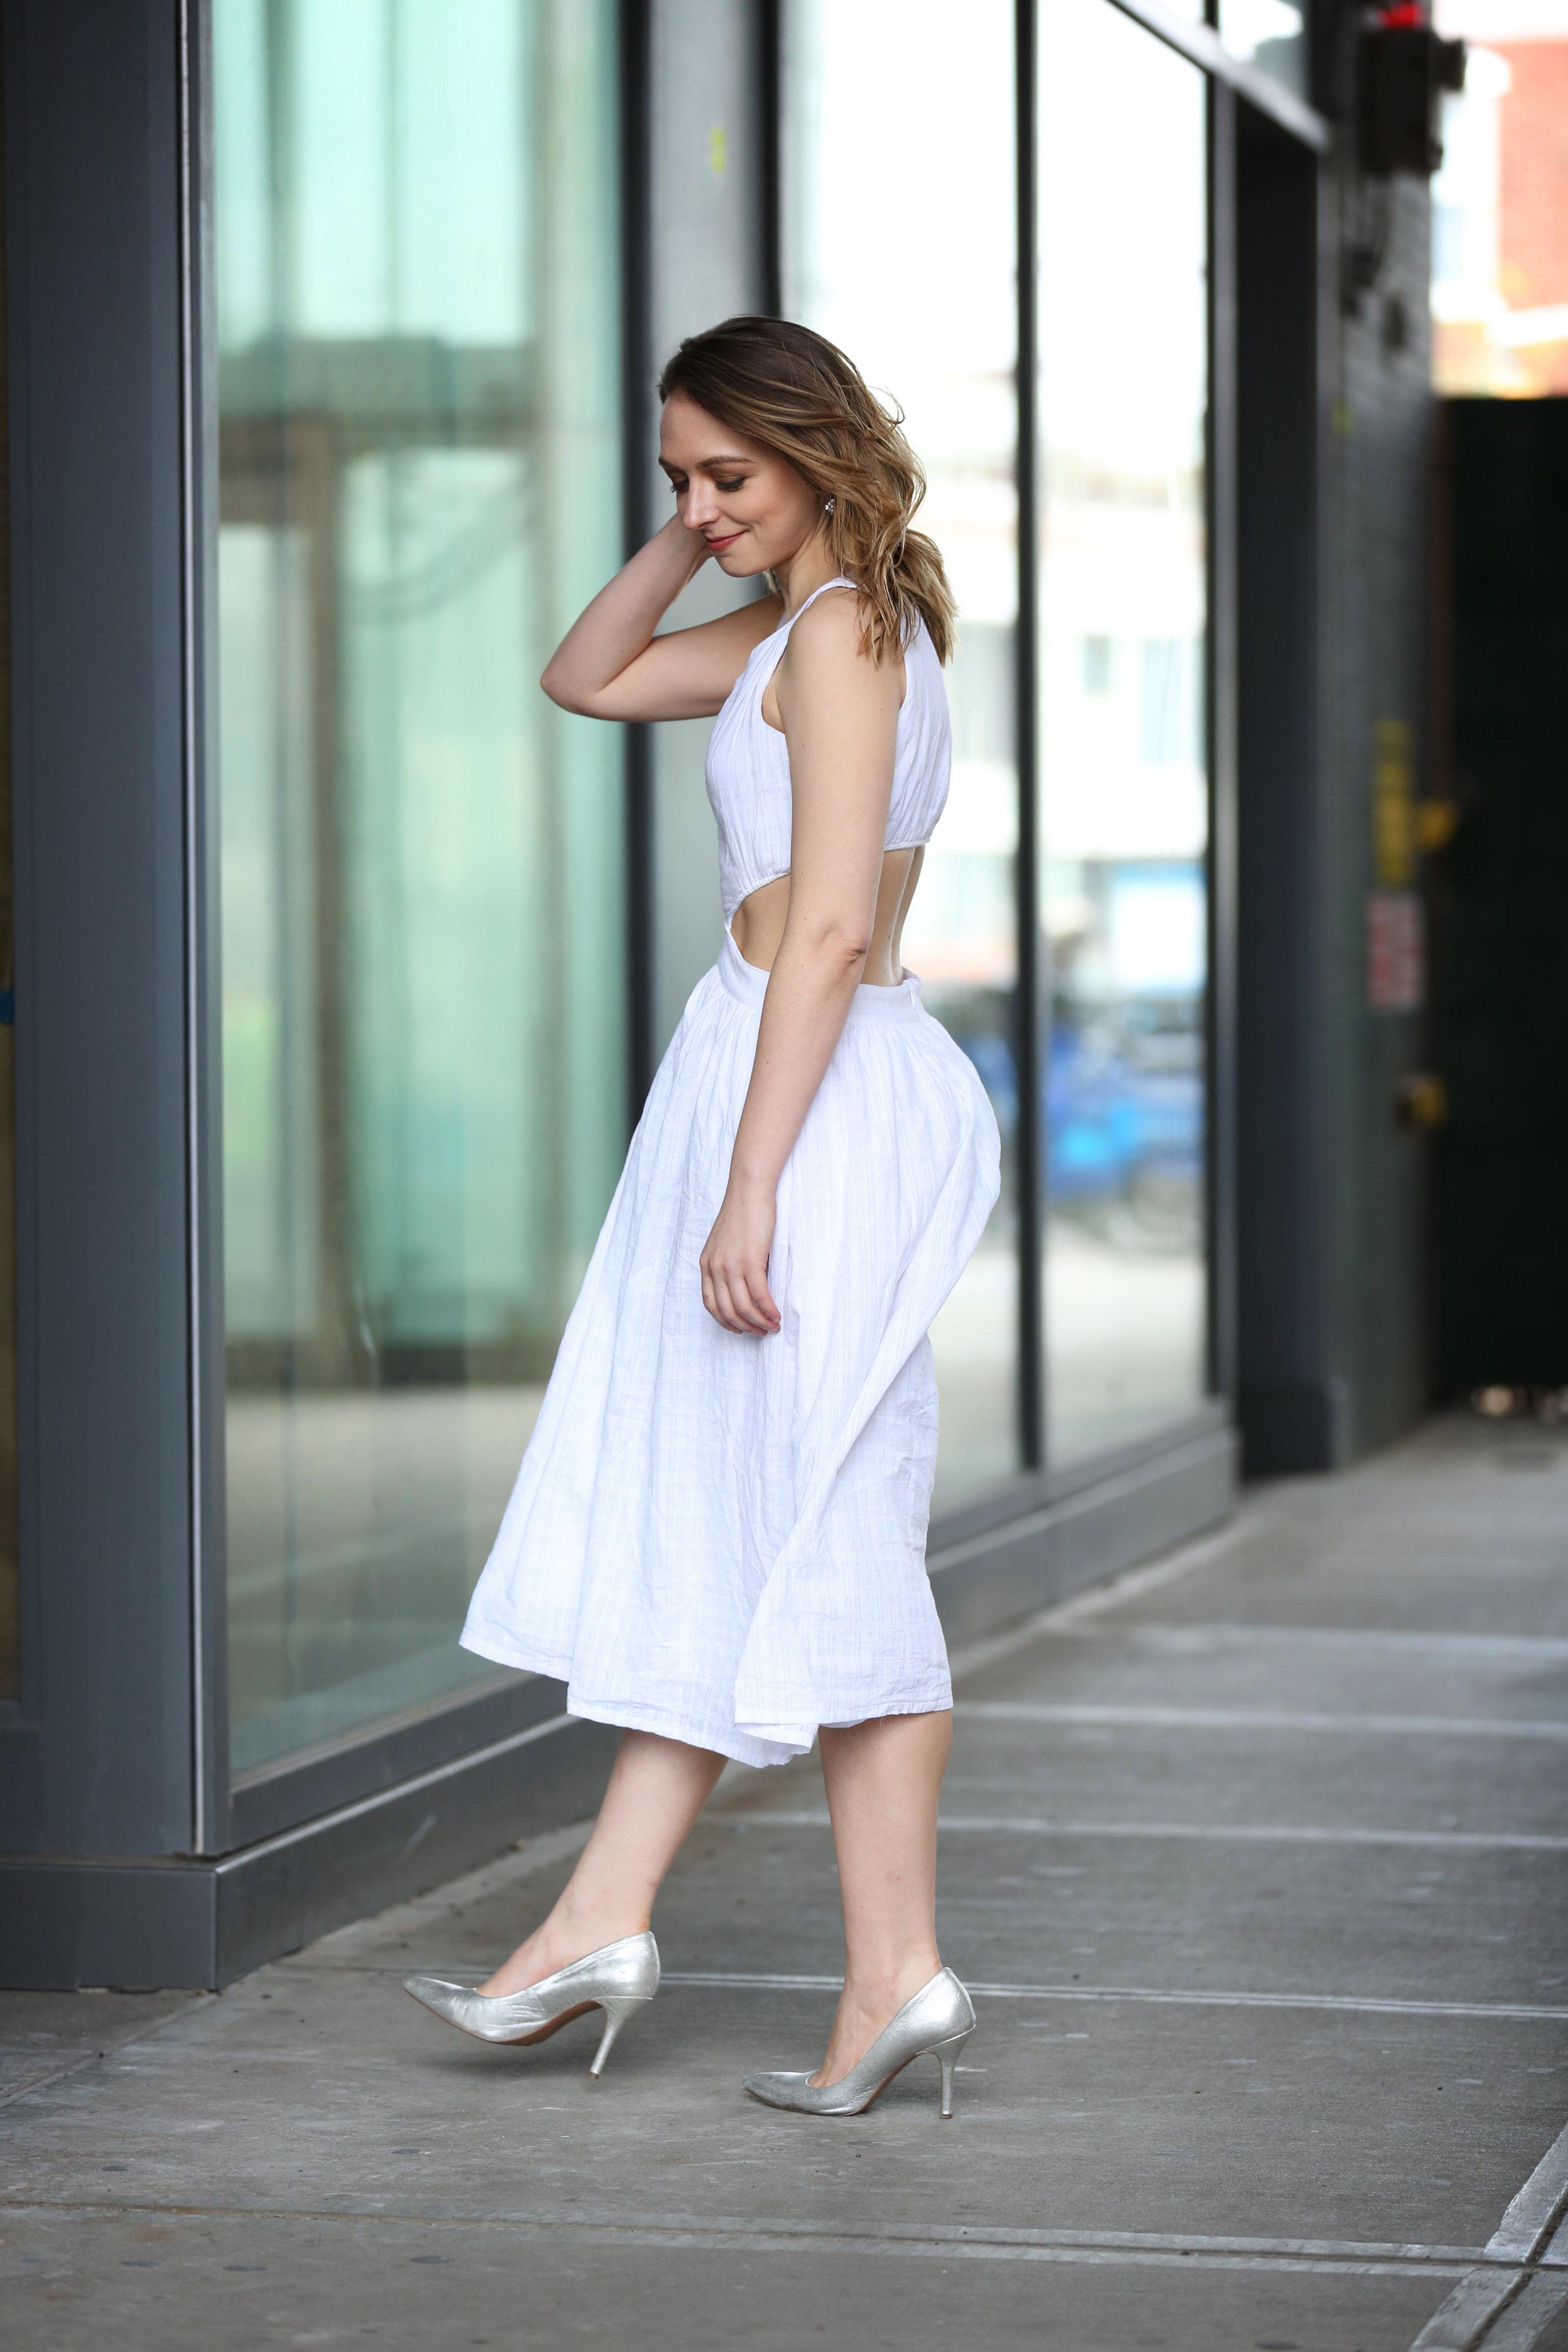 Holly-Anne-Williams-Photo16.jpg